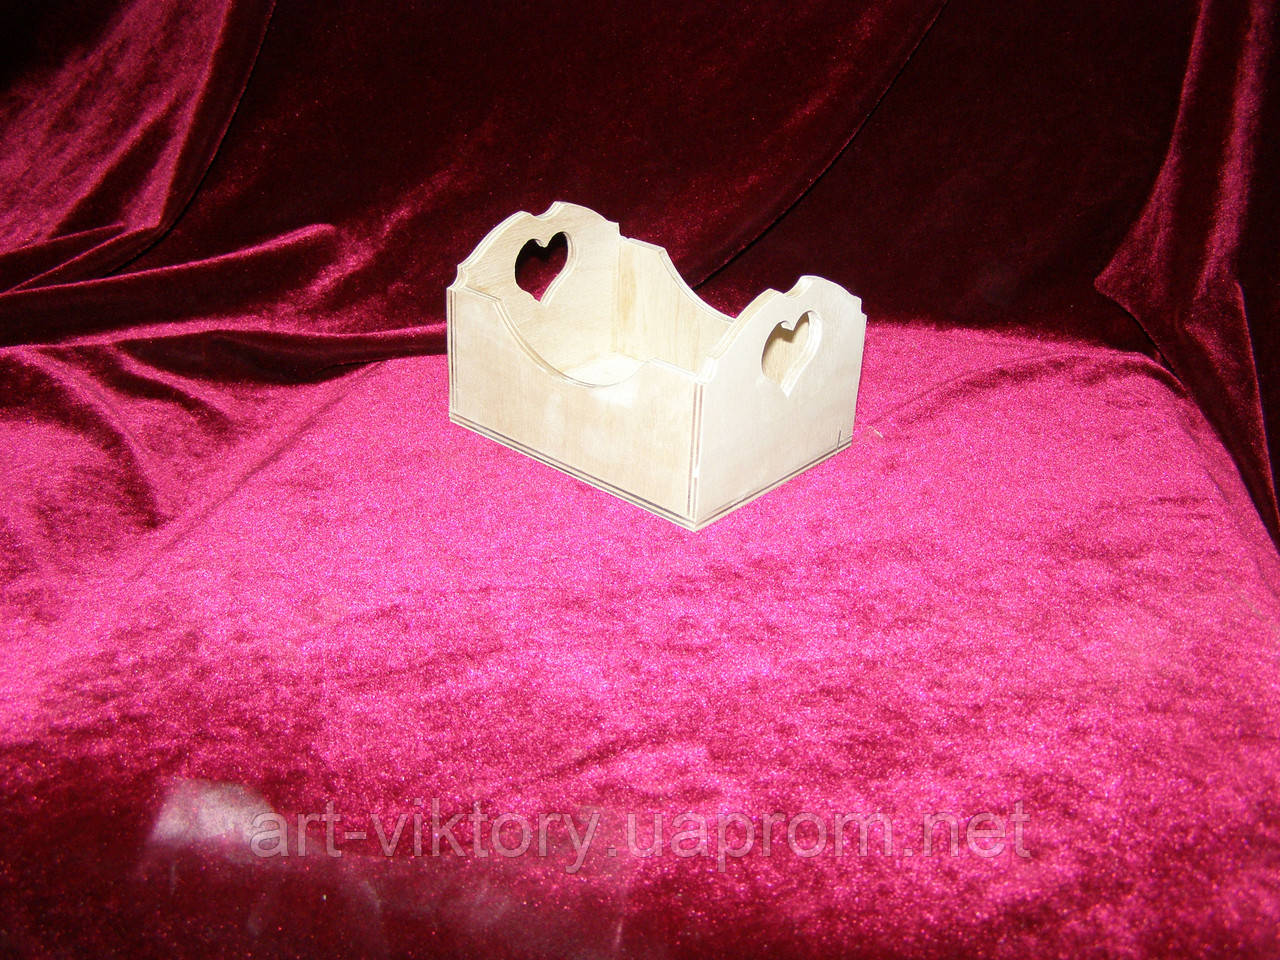 Короб с сердечком (9,5 х 12,5 х 8 см)